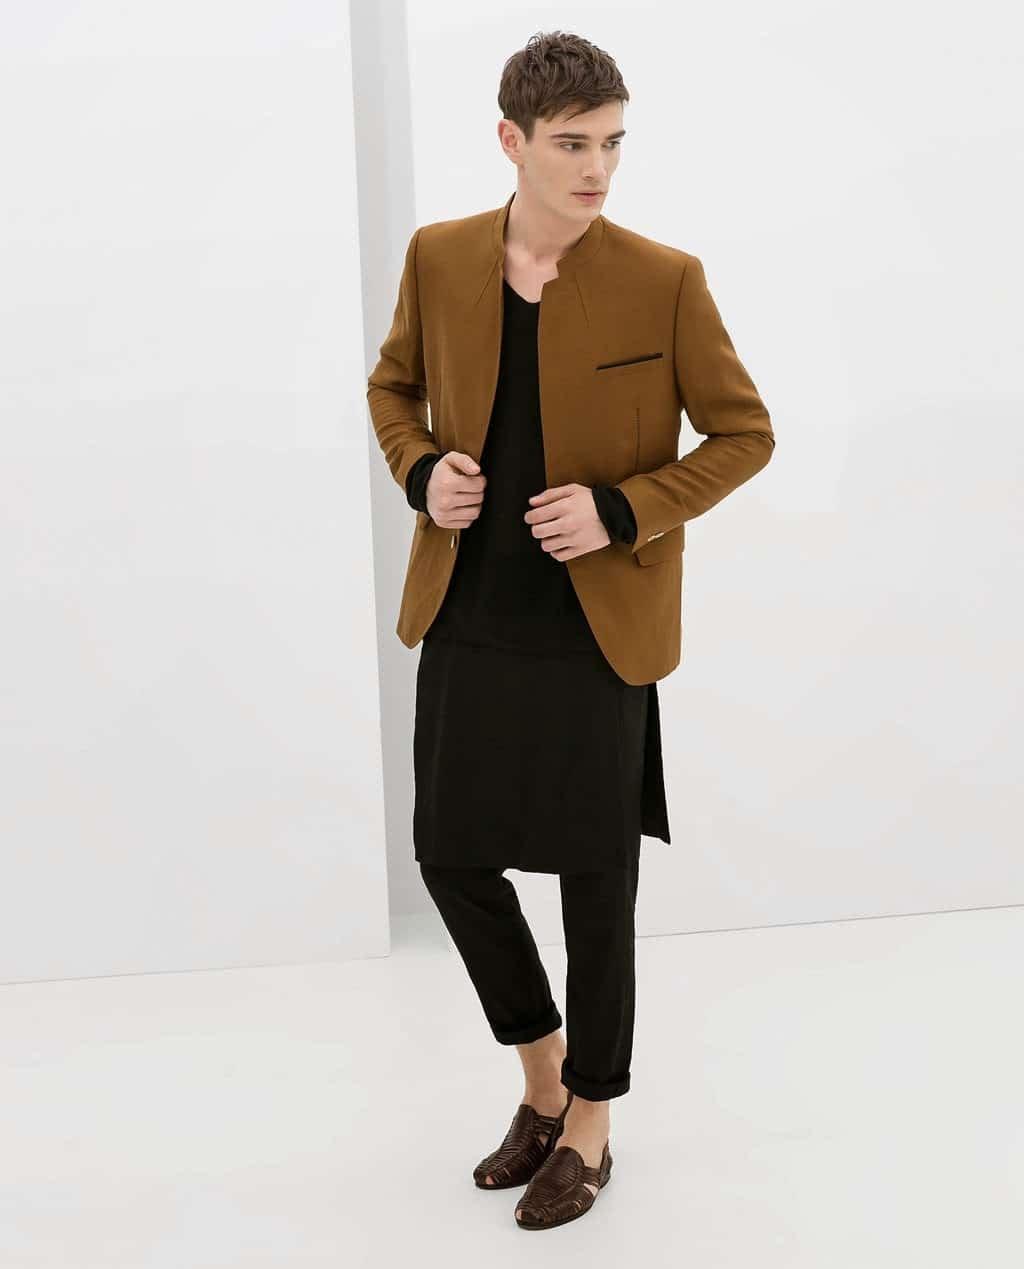 Tendance genderfluid - jupe pantalon Zara pour homme en 2014